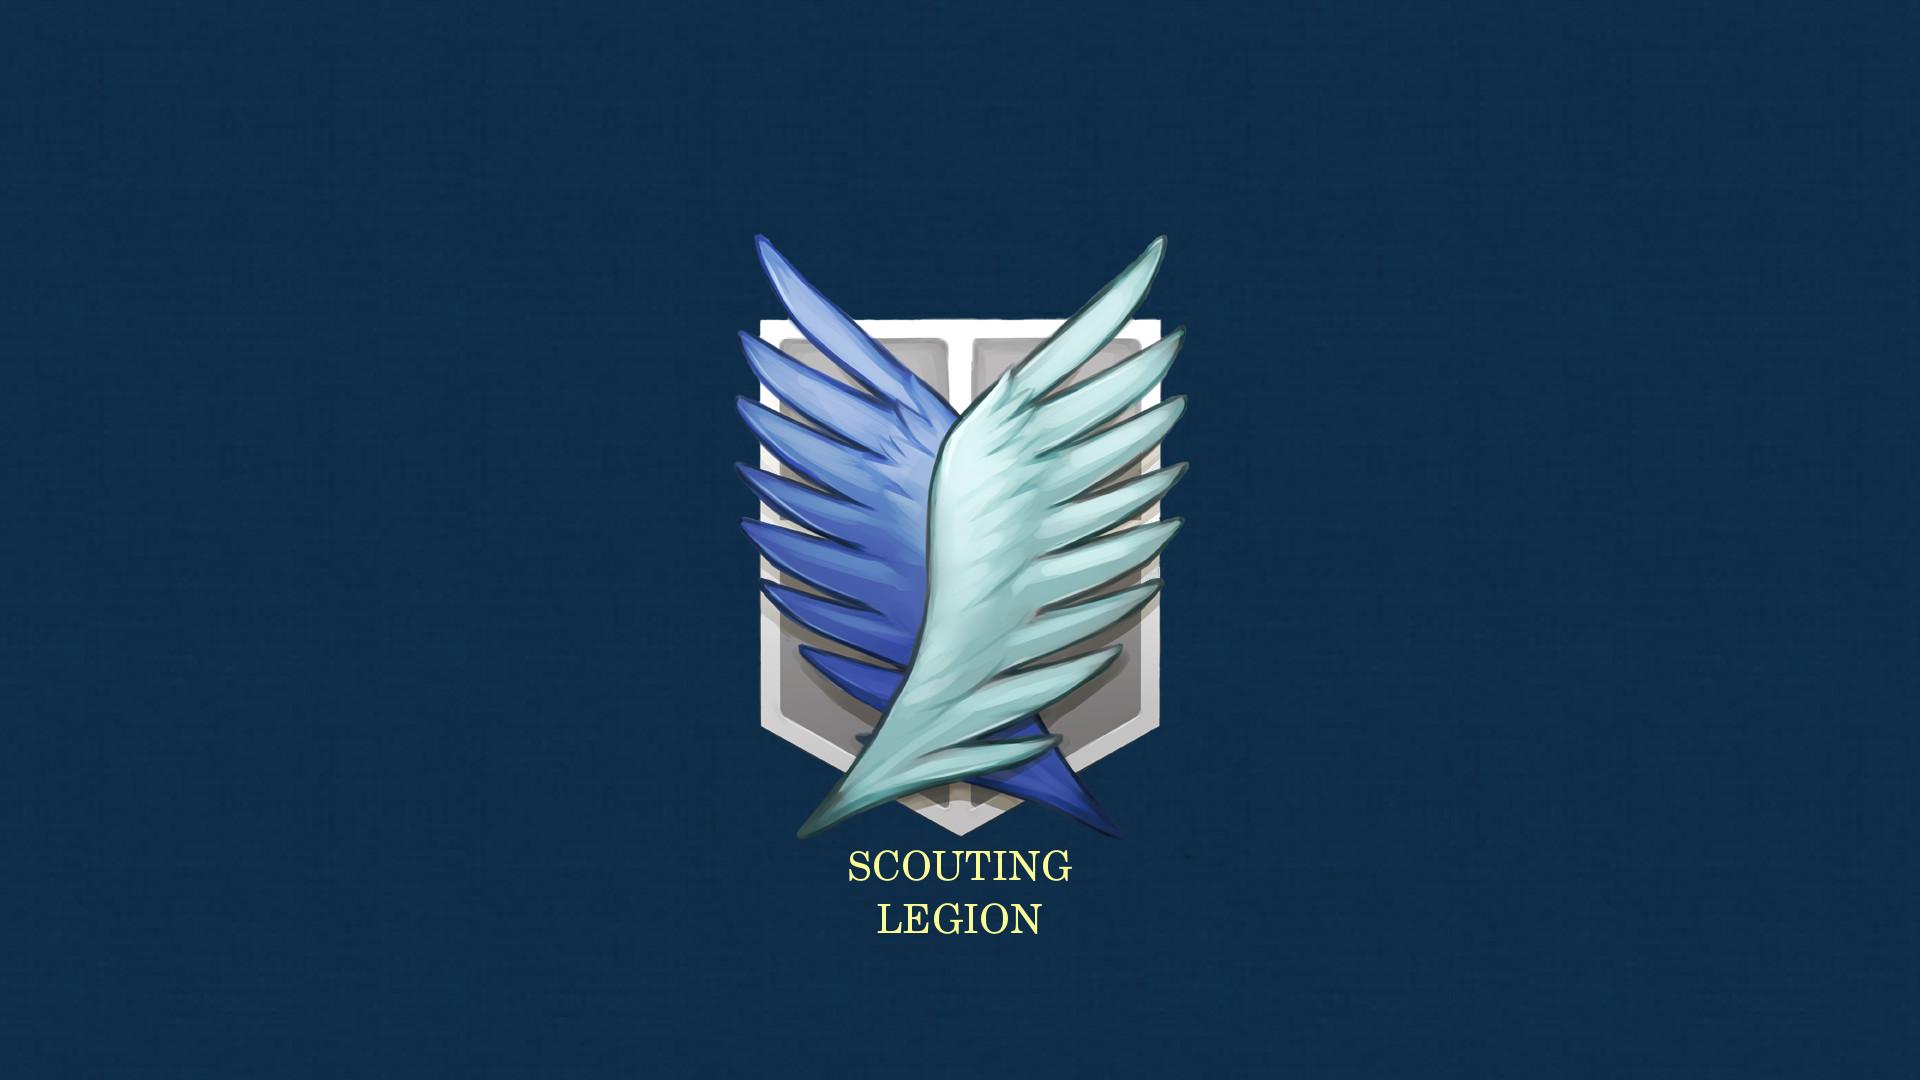 73 Scouting Legion